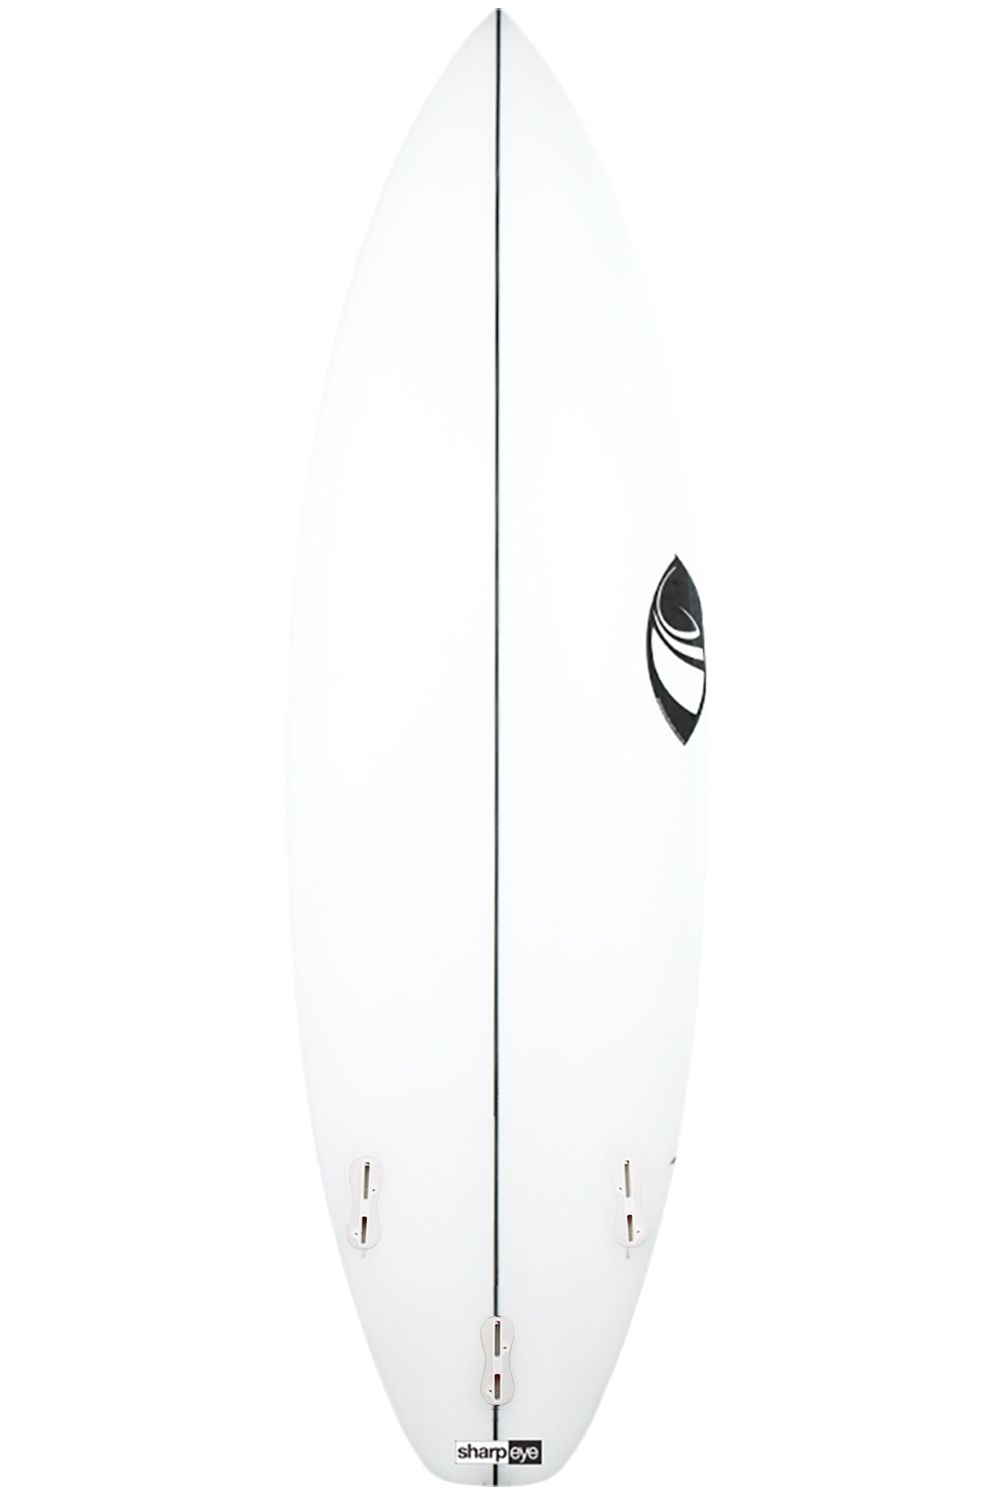 Prancha Surf Sharpeye DISCO 5'10 Squash Tail - White FCS II 5ft10